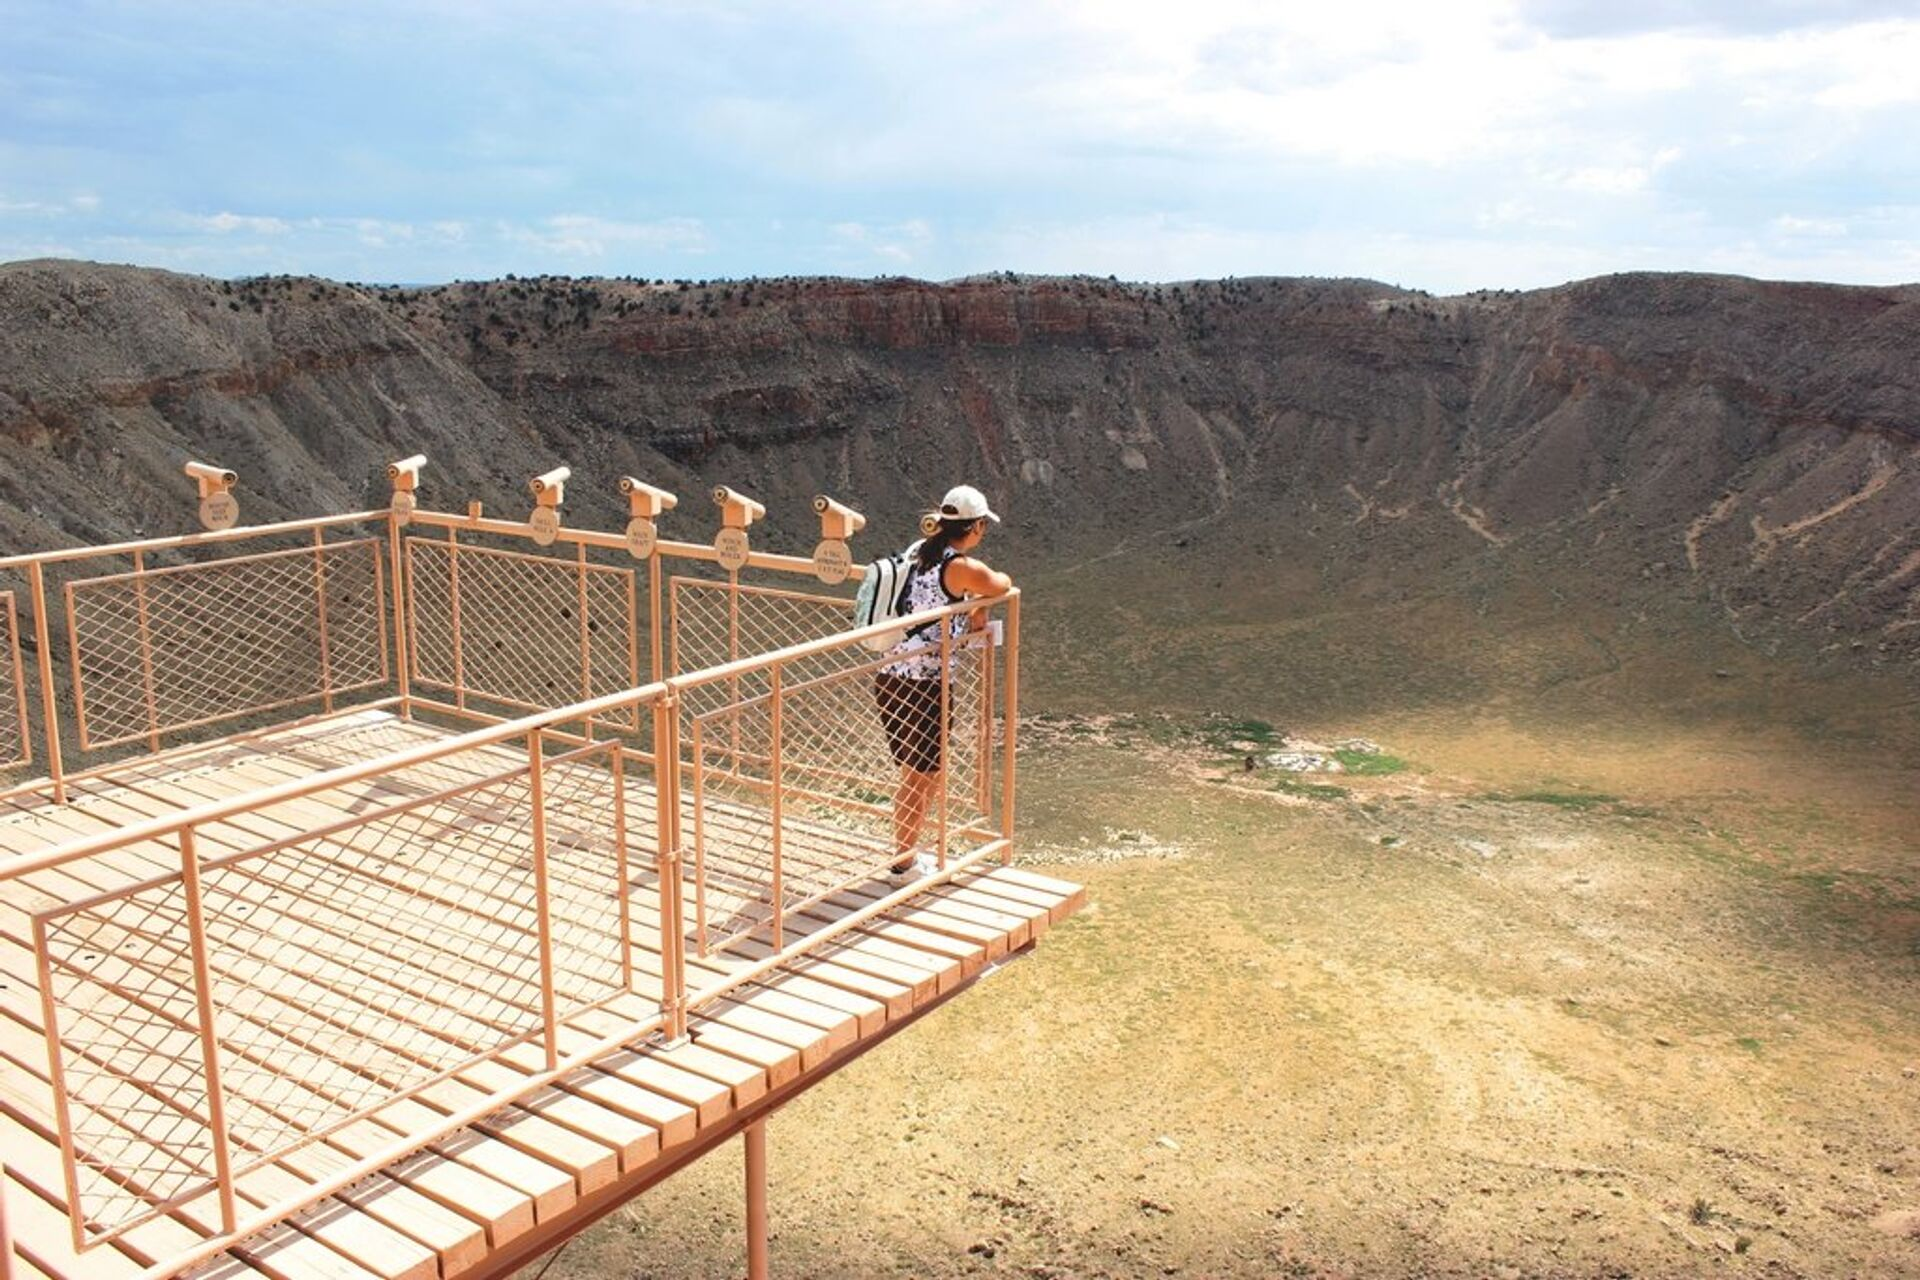 Аризонский метеоритный кратер, штат Аризона, США - РИА Новости, 1920, 08.04.2021